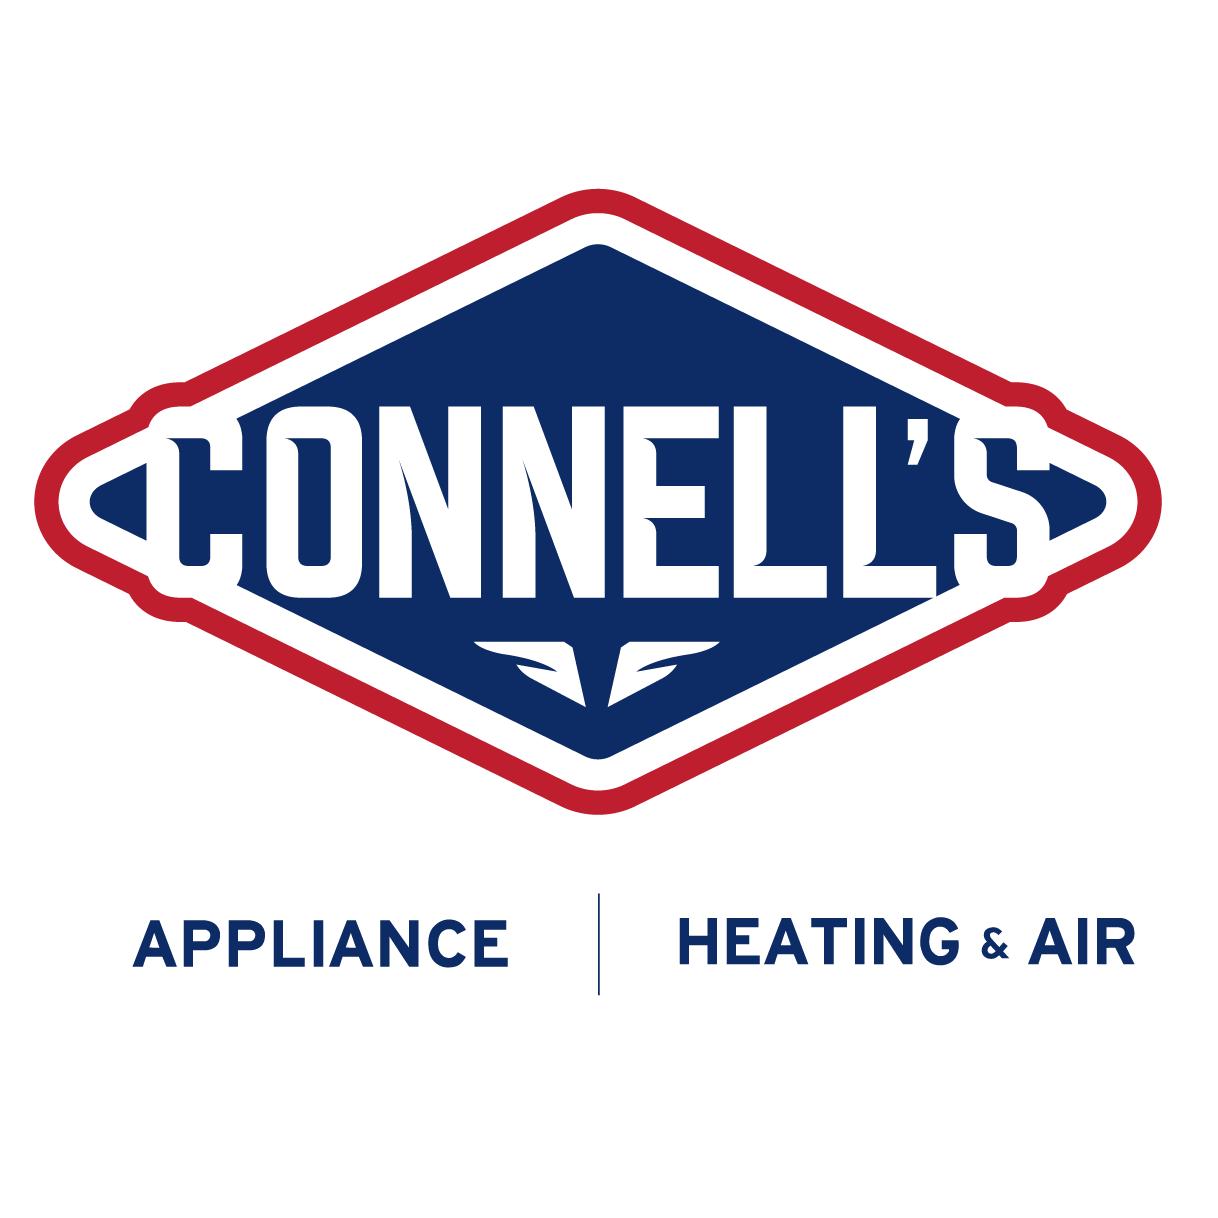 Connell's Service Company, INC